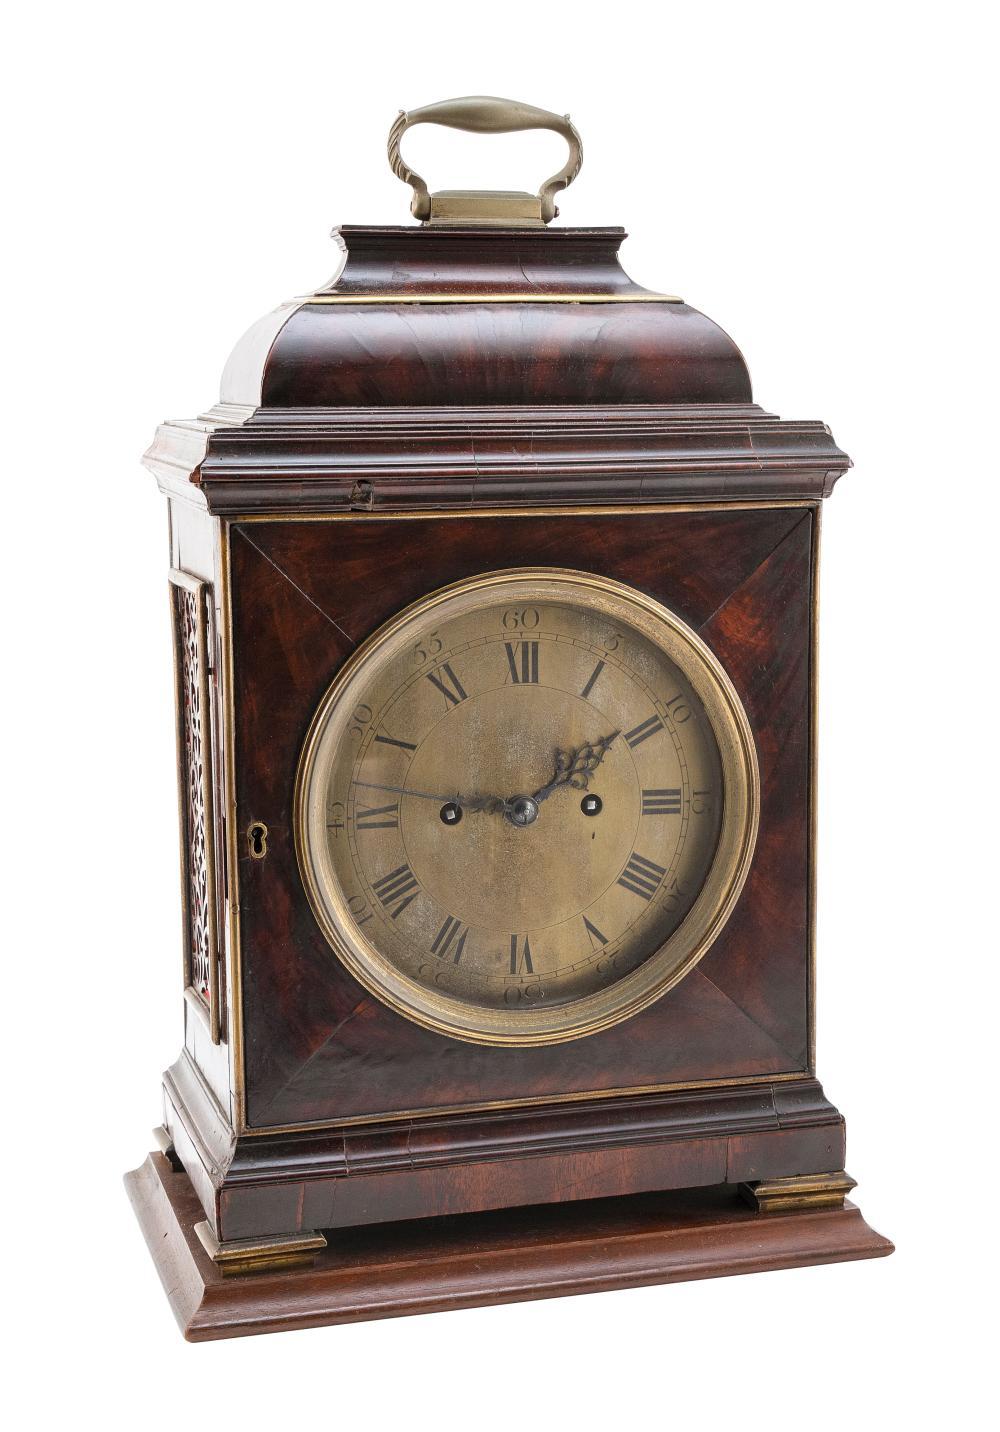 "ENGLISH BRACKET CLOCK BY JOHN ELLICOTT London, 18th Century Height 19.5"". Width 11.5"". Depth 8""."